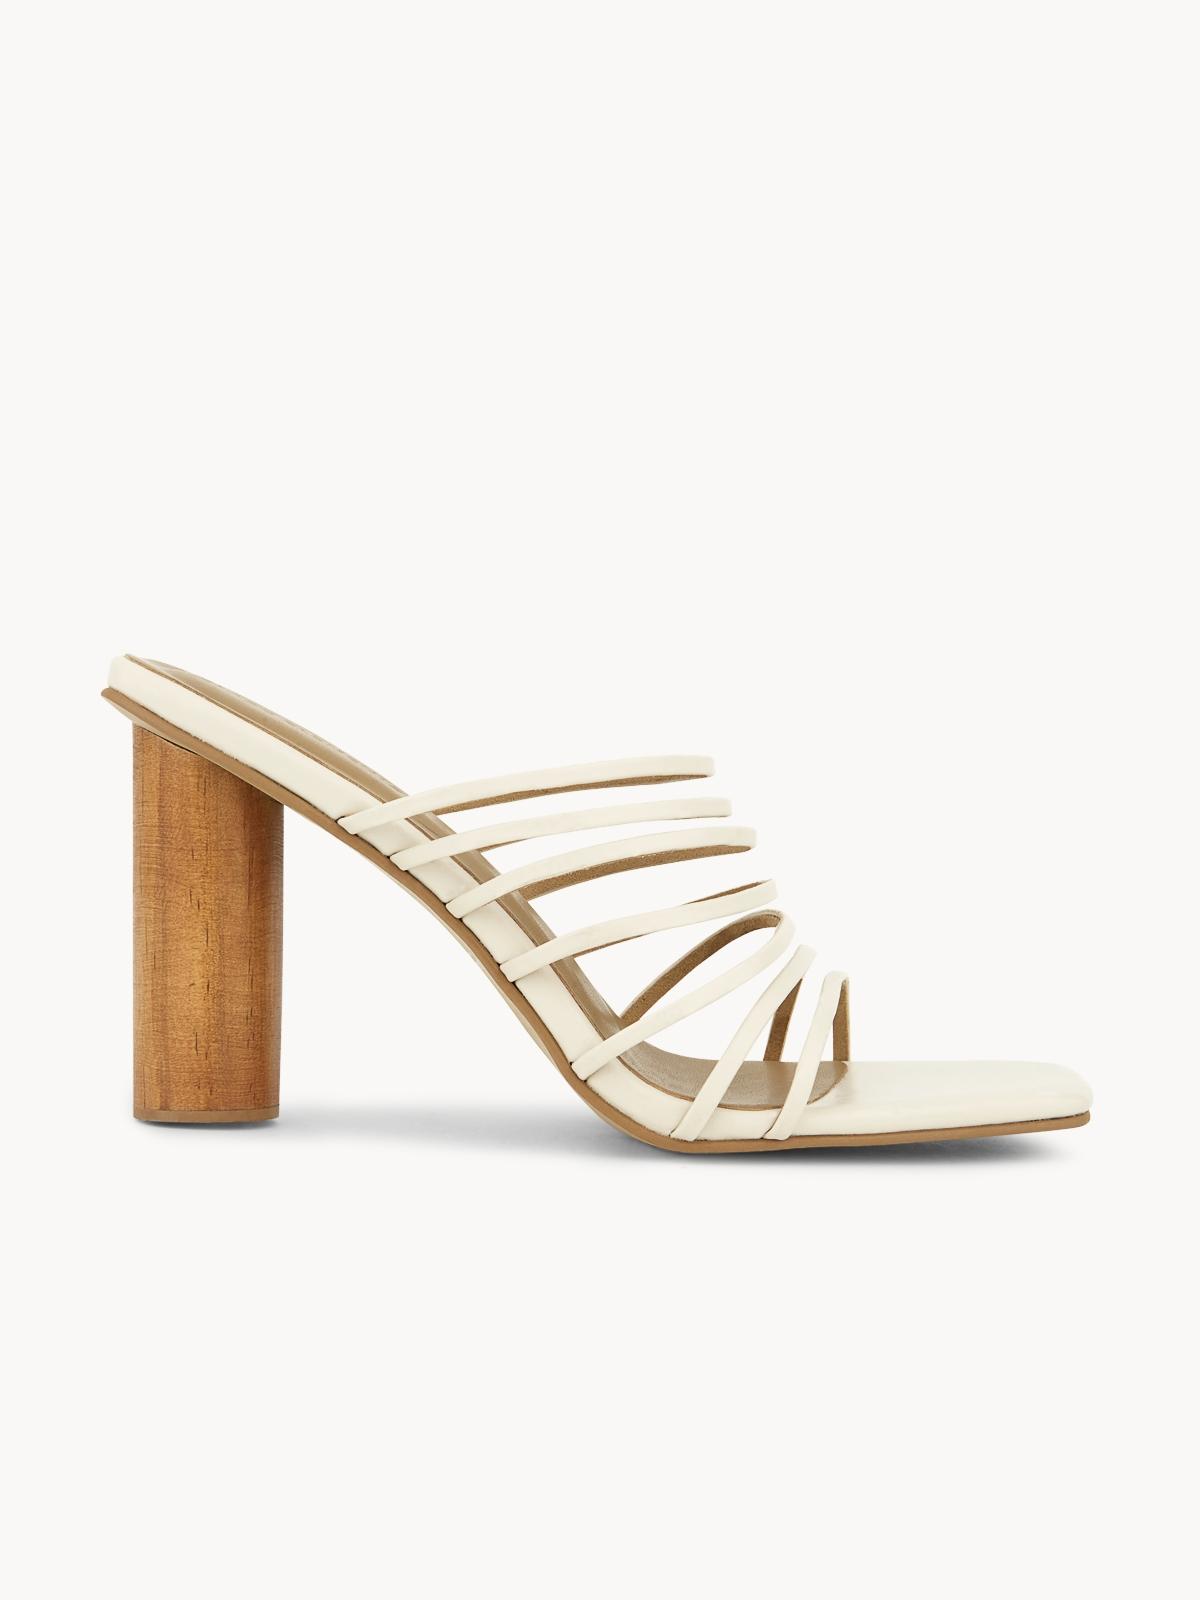 Blaze Candice Strappy Wooden Heels Ivory